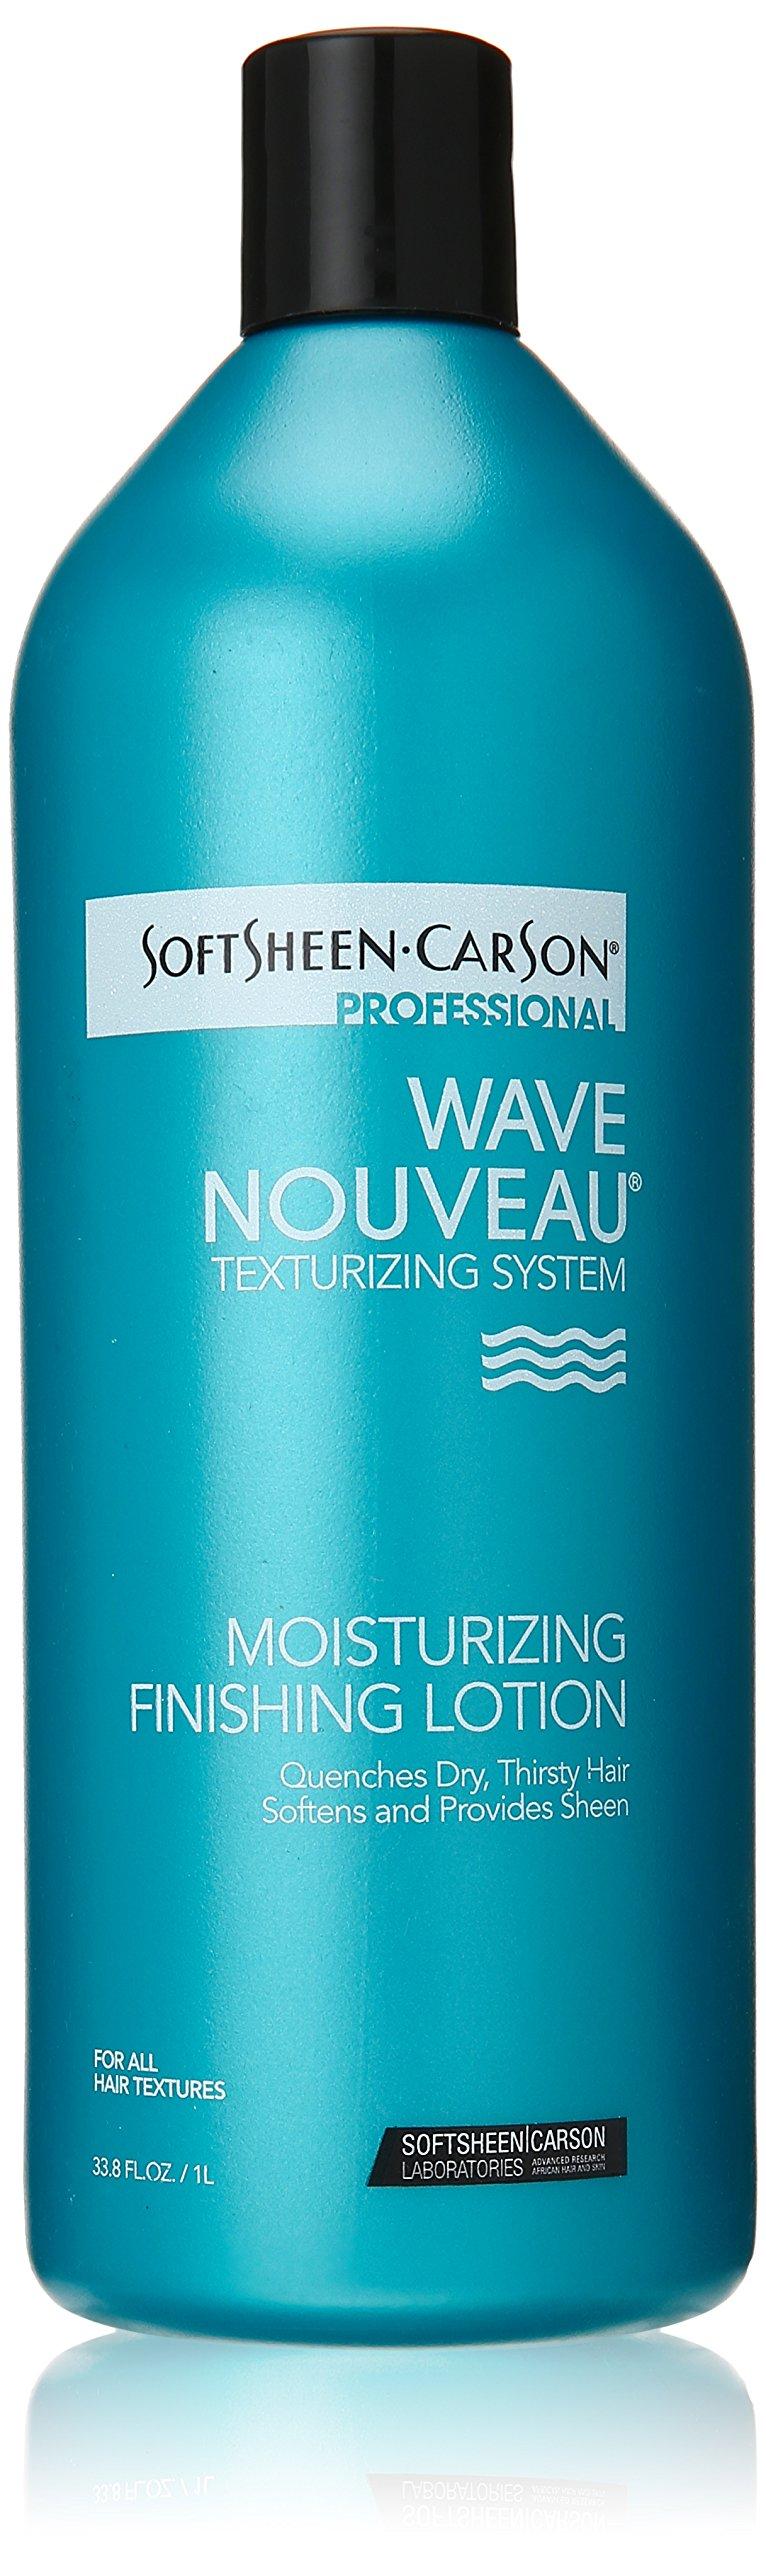 Wave Nouveau Moisturizer Finishing Lotion 33.8 oz